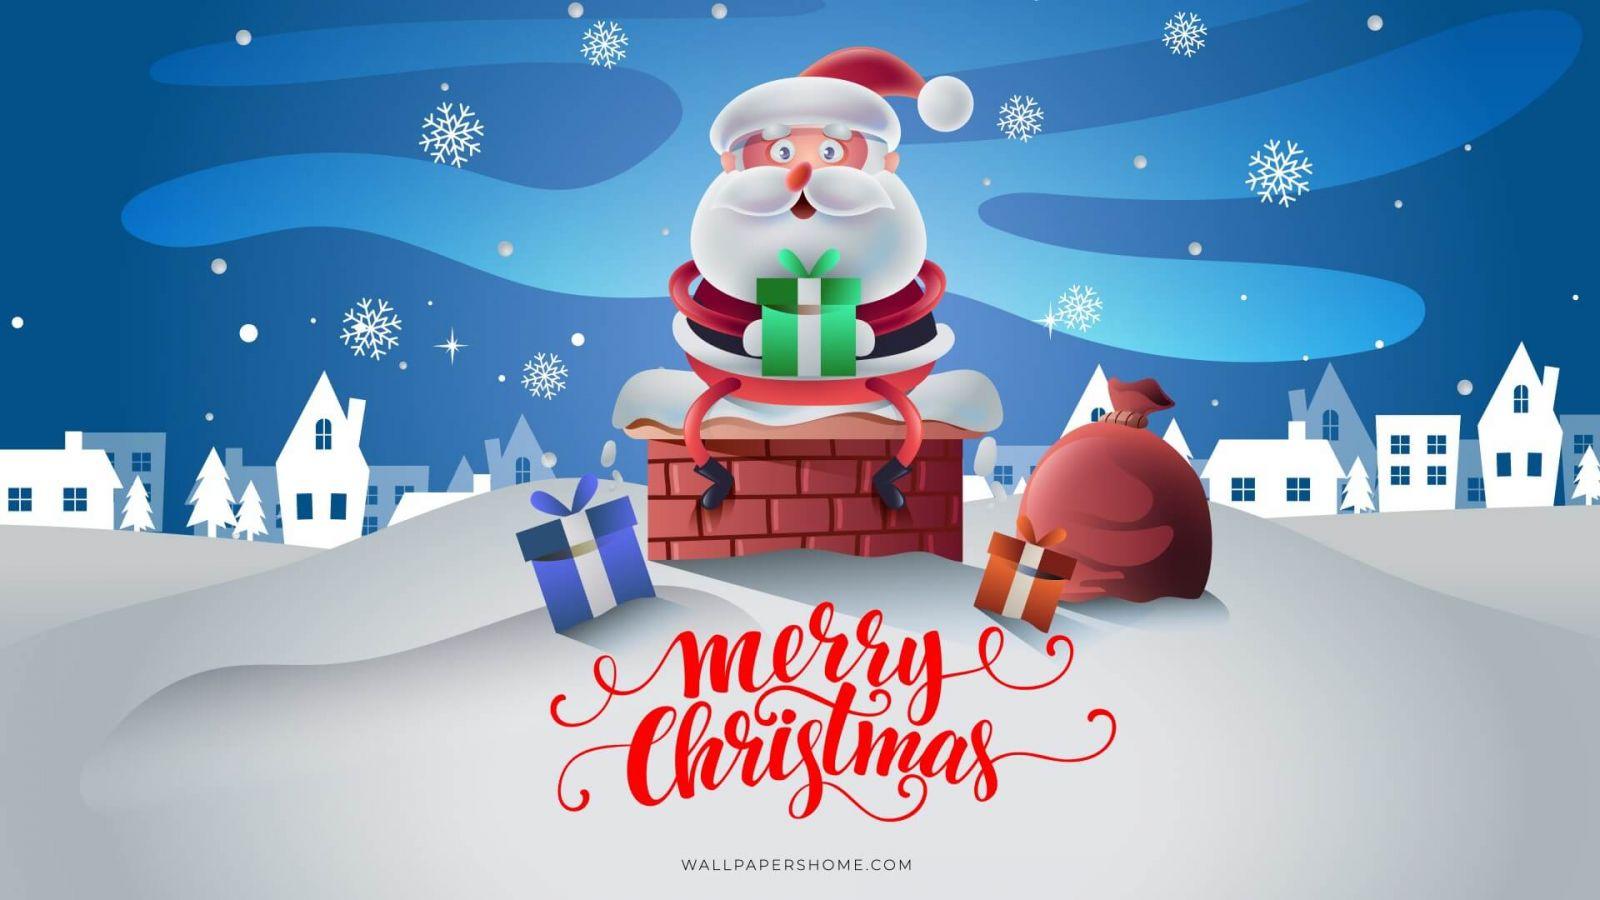 Mac Hd Christmas Wallpaper Christmas 2019 Desktop Wallpaper Hd 1600x900 Wallpaper Teahub Io